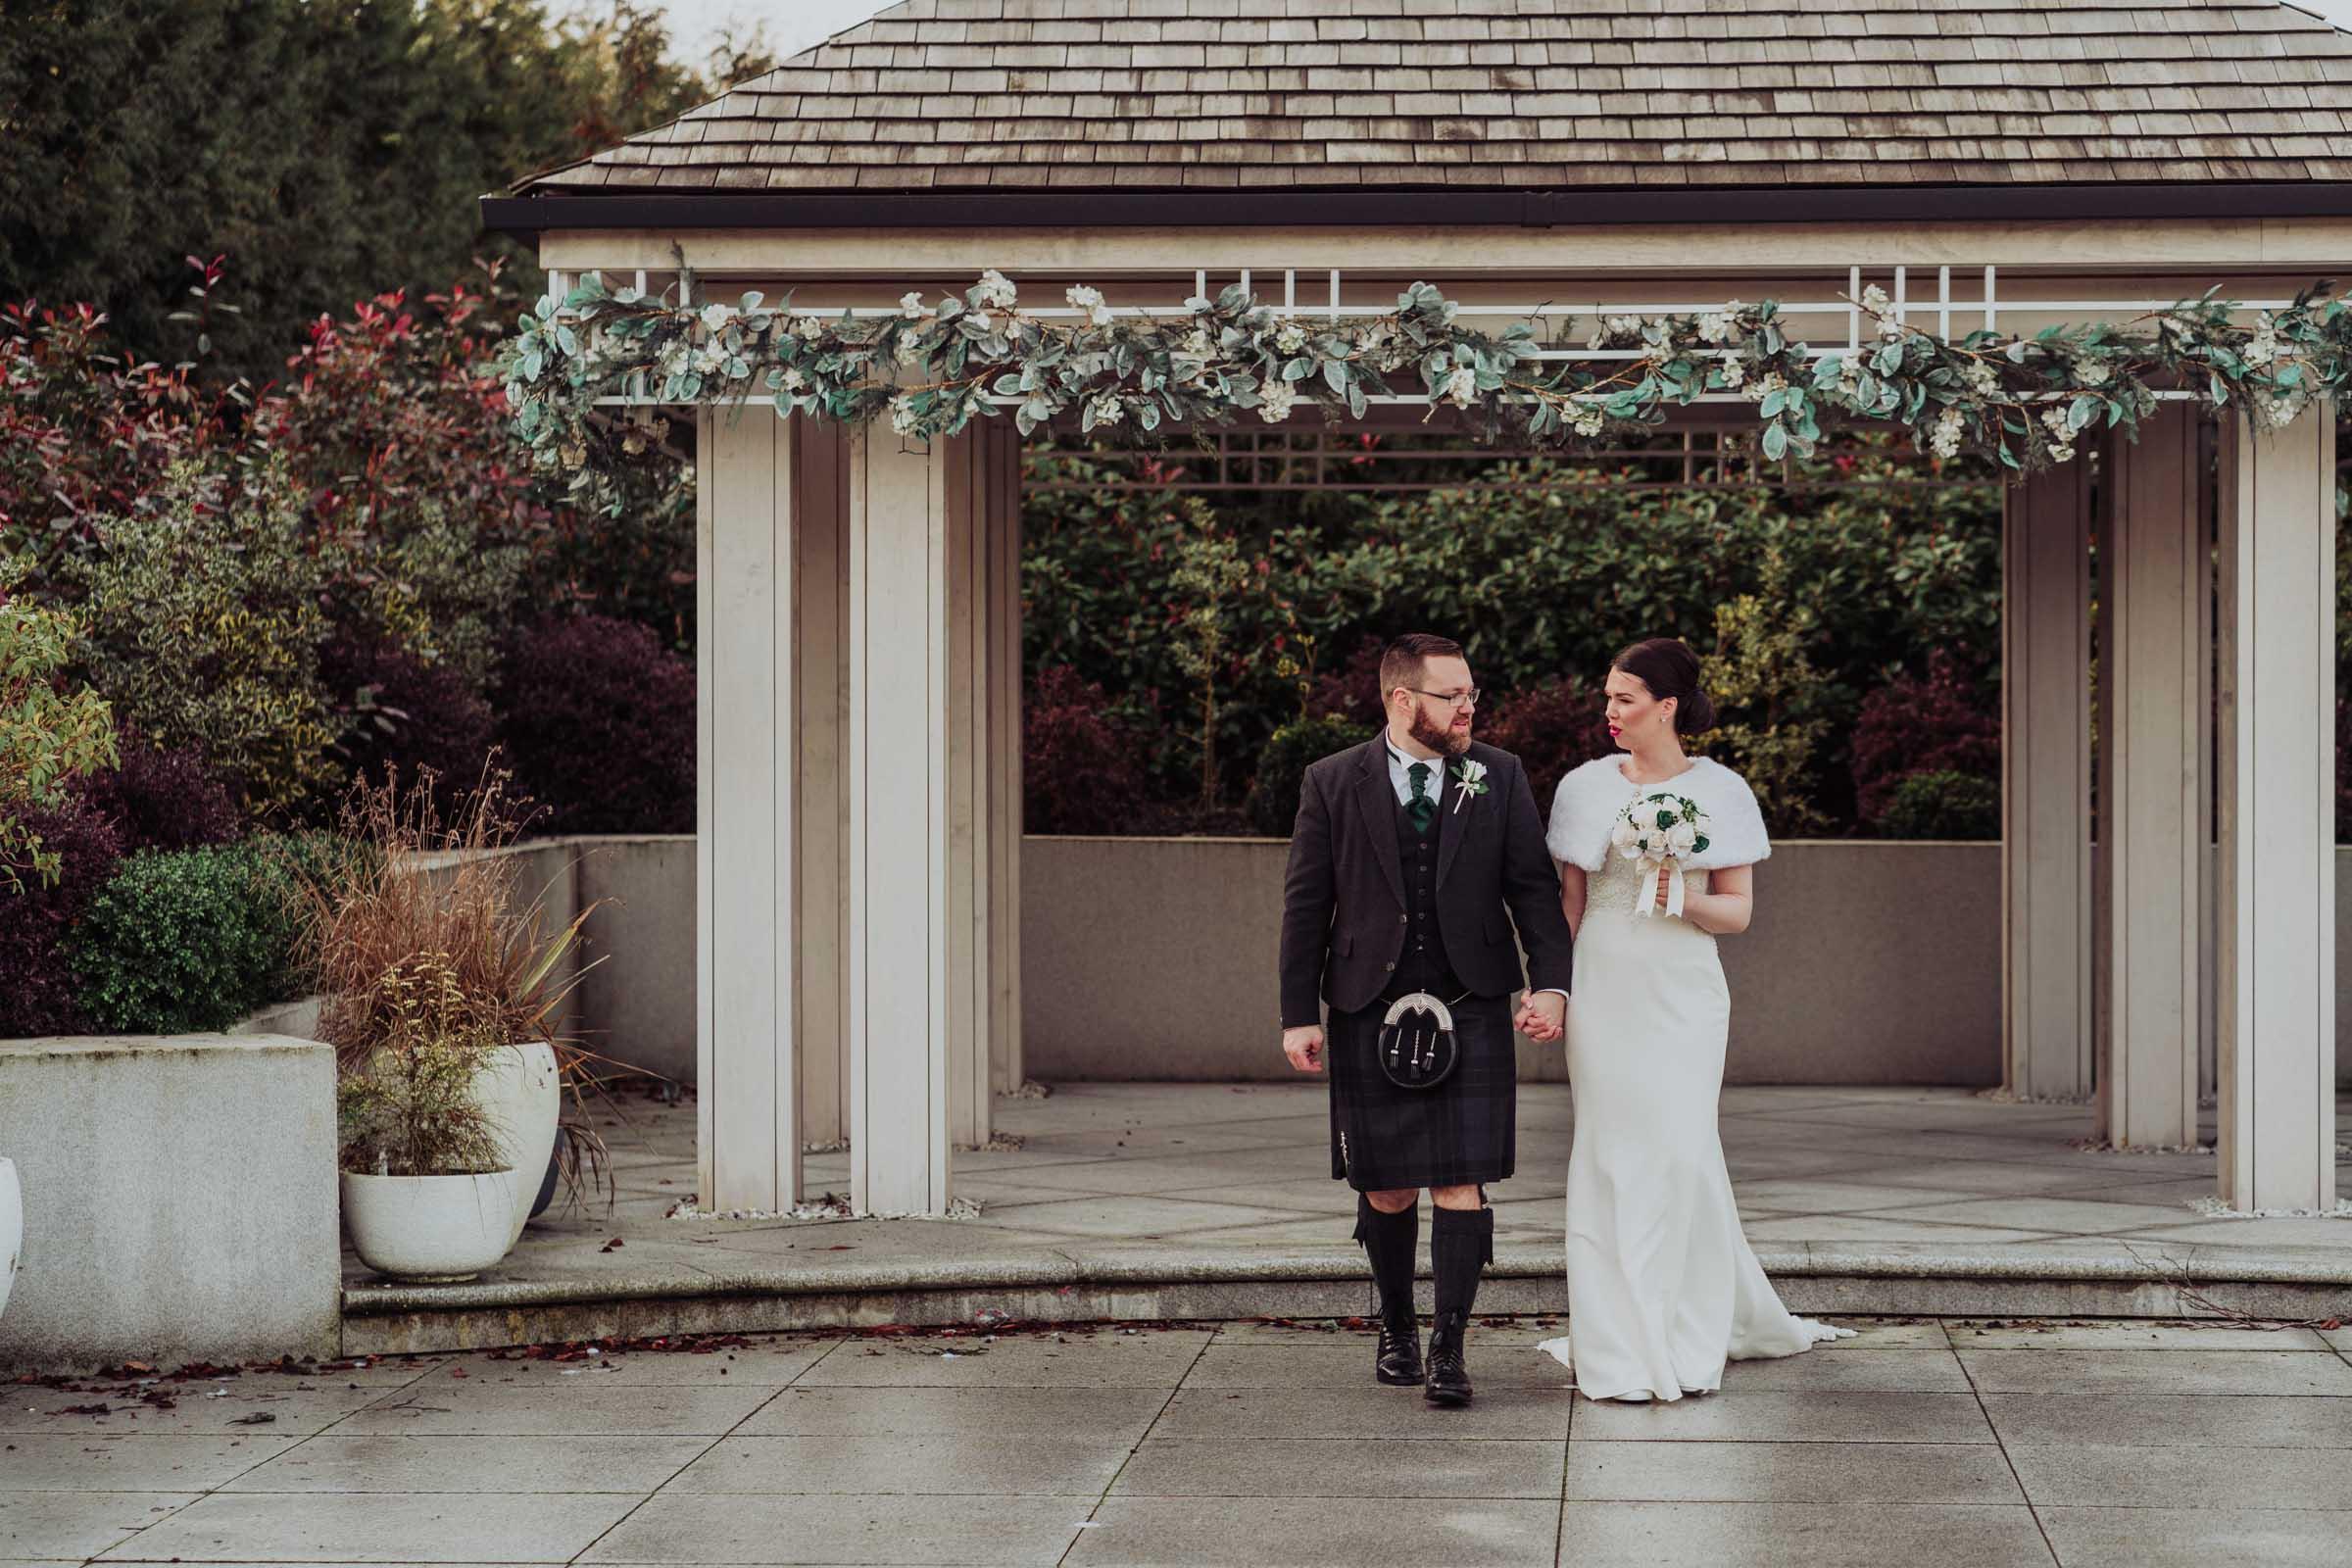 Radstone-Wedding-Dearly-Photography-Scotland (38 of 50).jpg